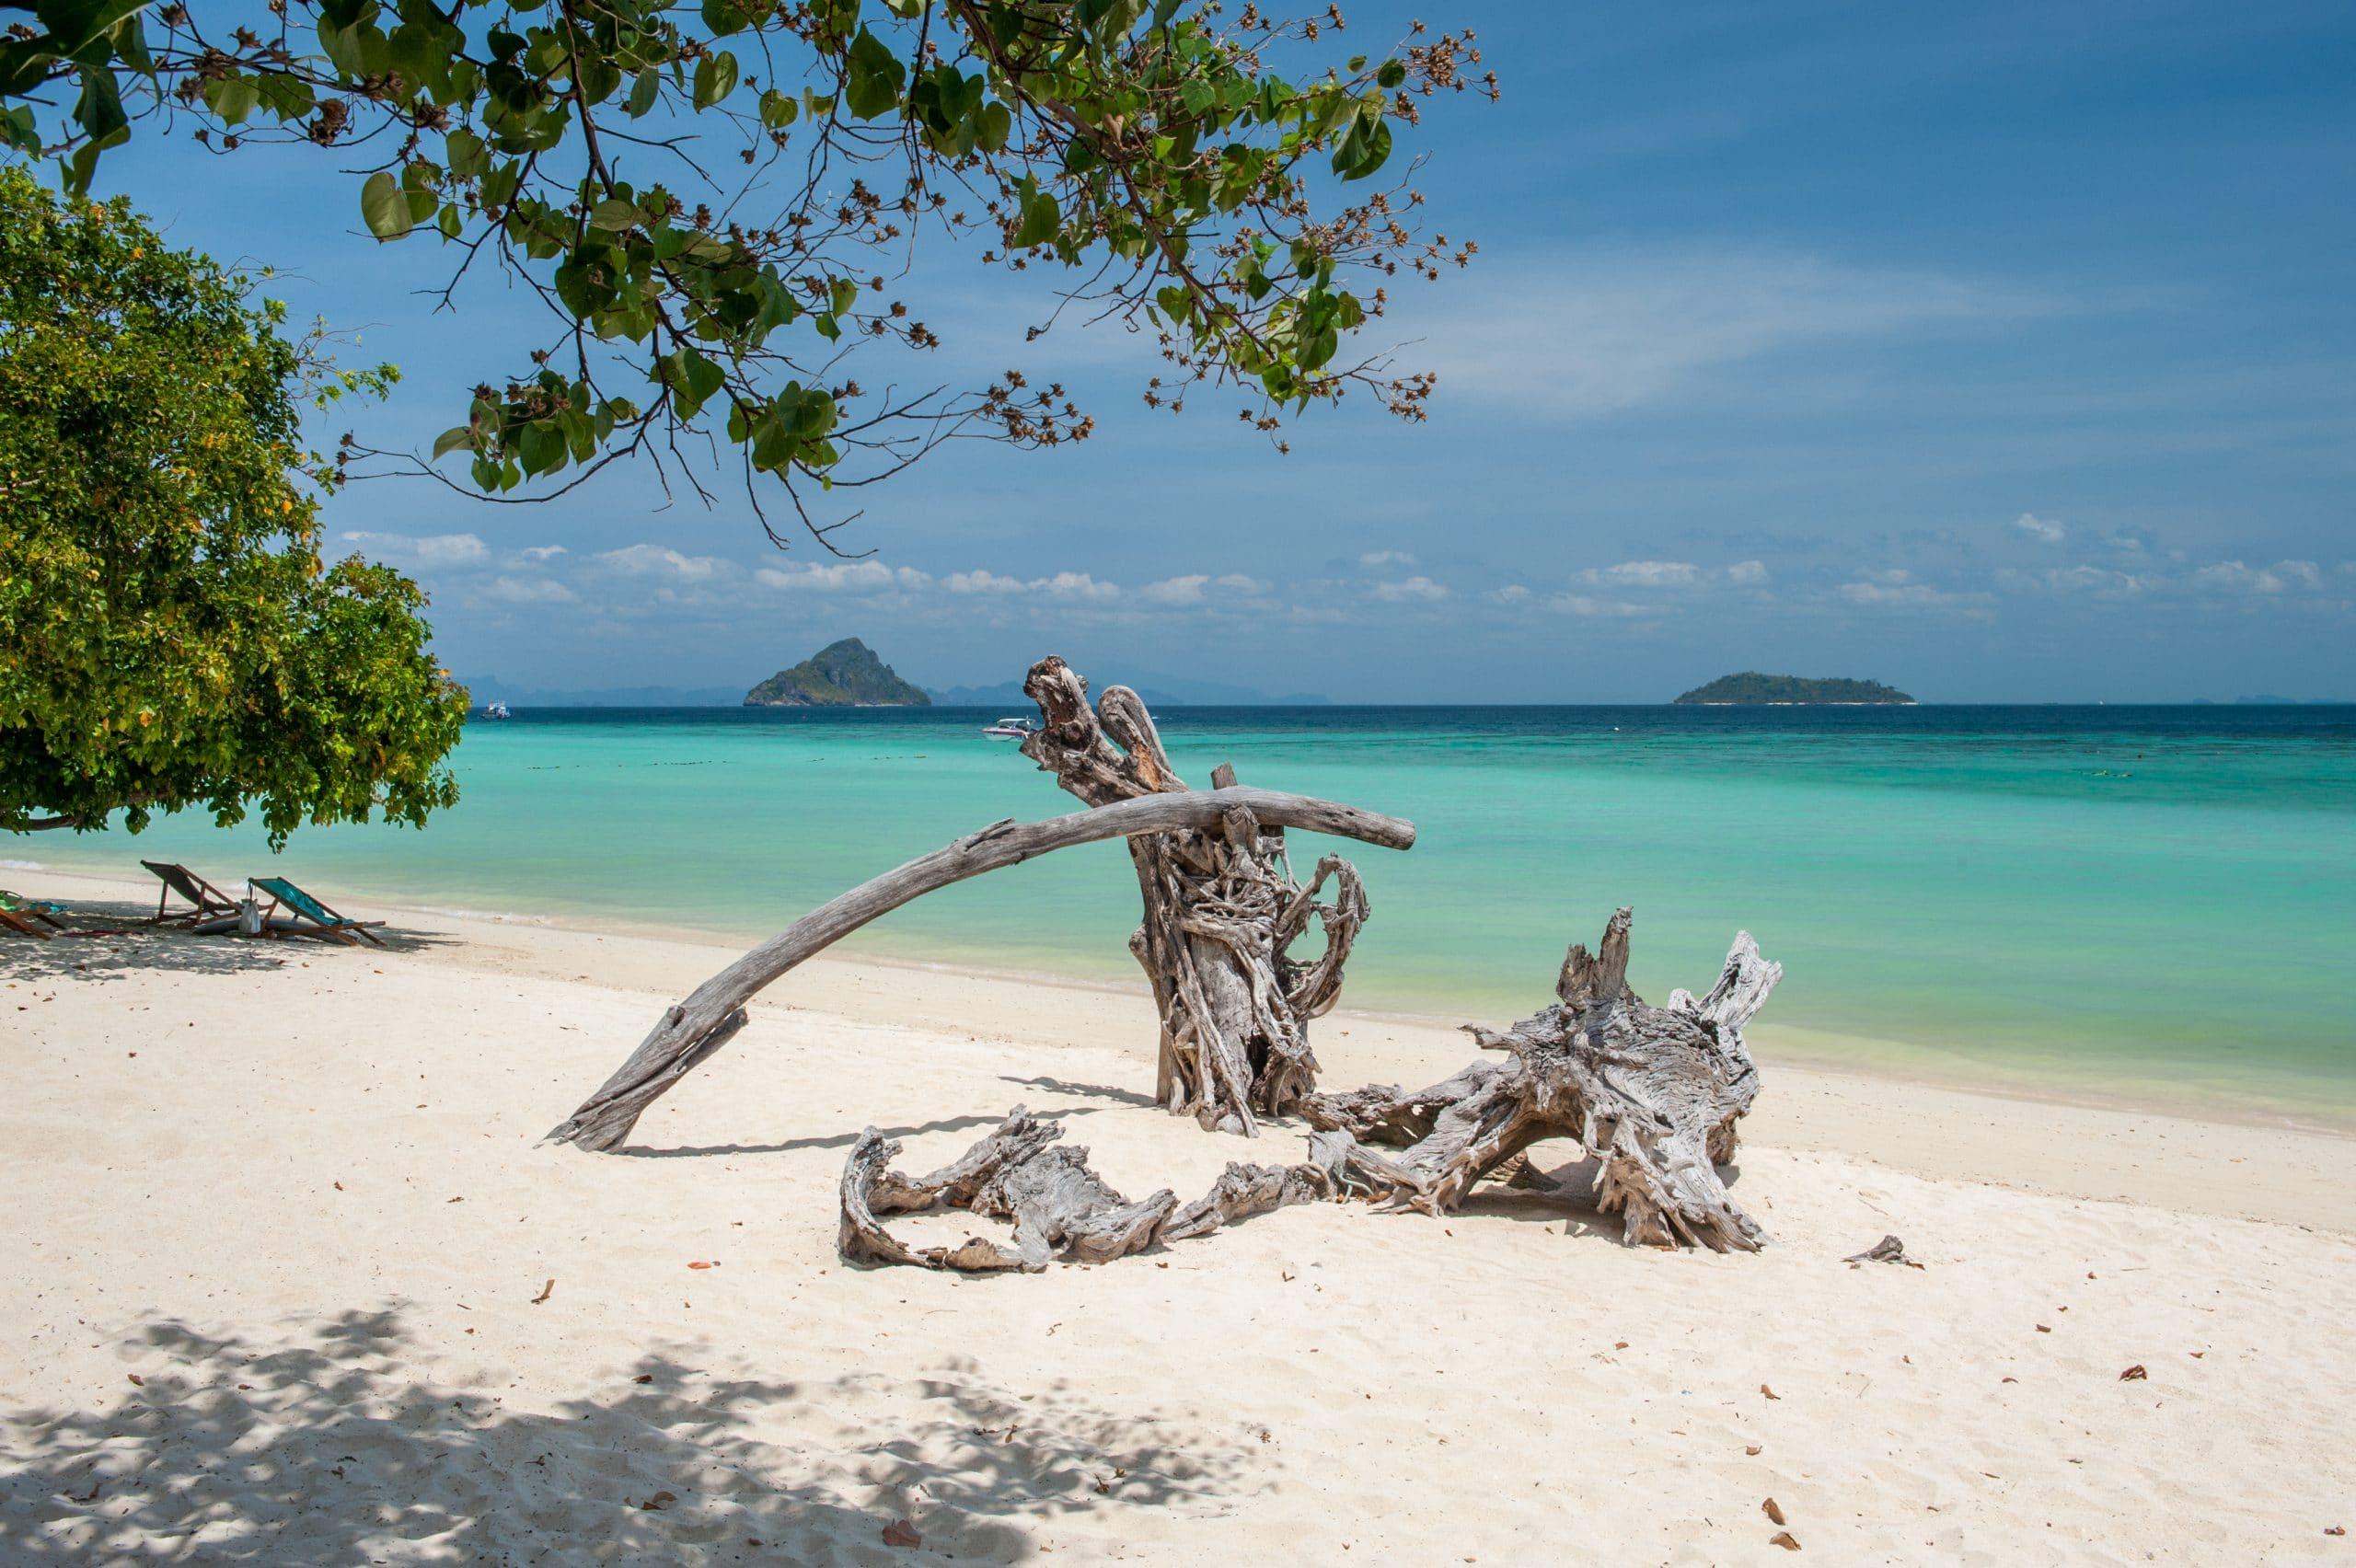 laem tong beach thailand koh phi phi